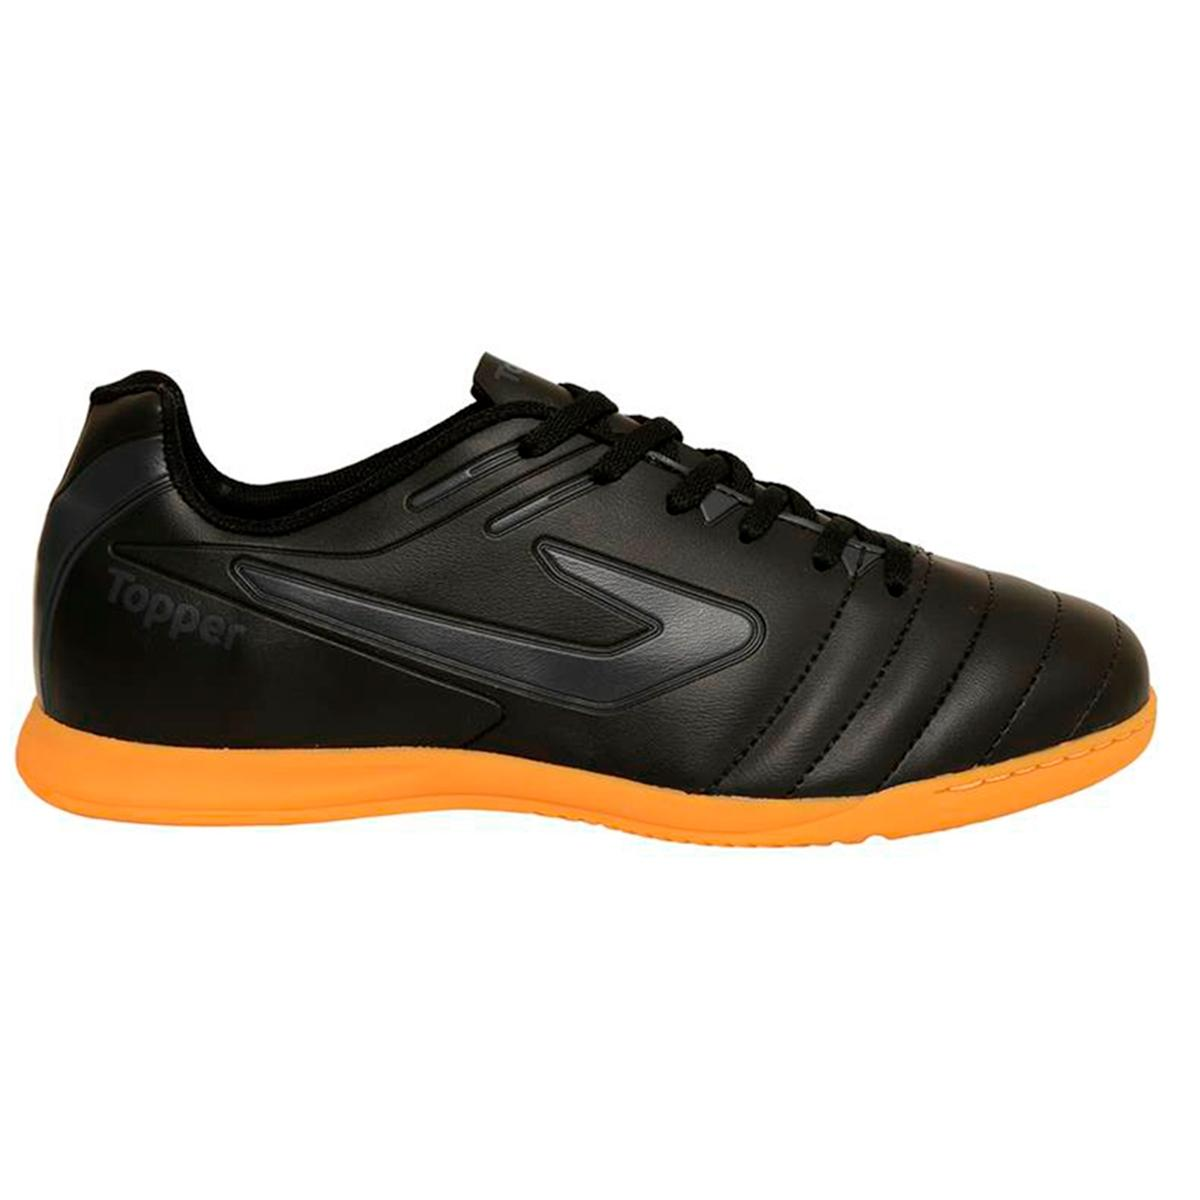 Chuteira Boleiro Futsal - Topper - Chuteira - Magazine Luiza 4edd527975cbb